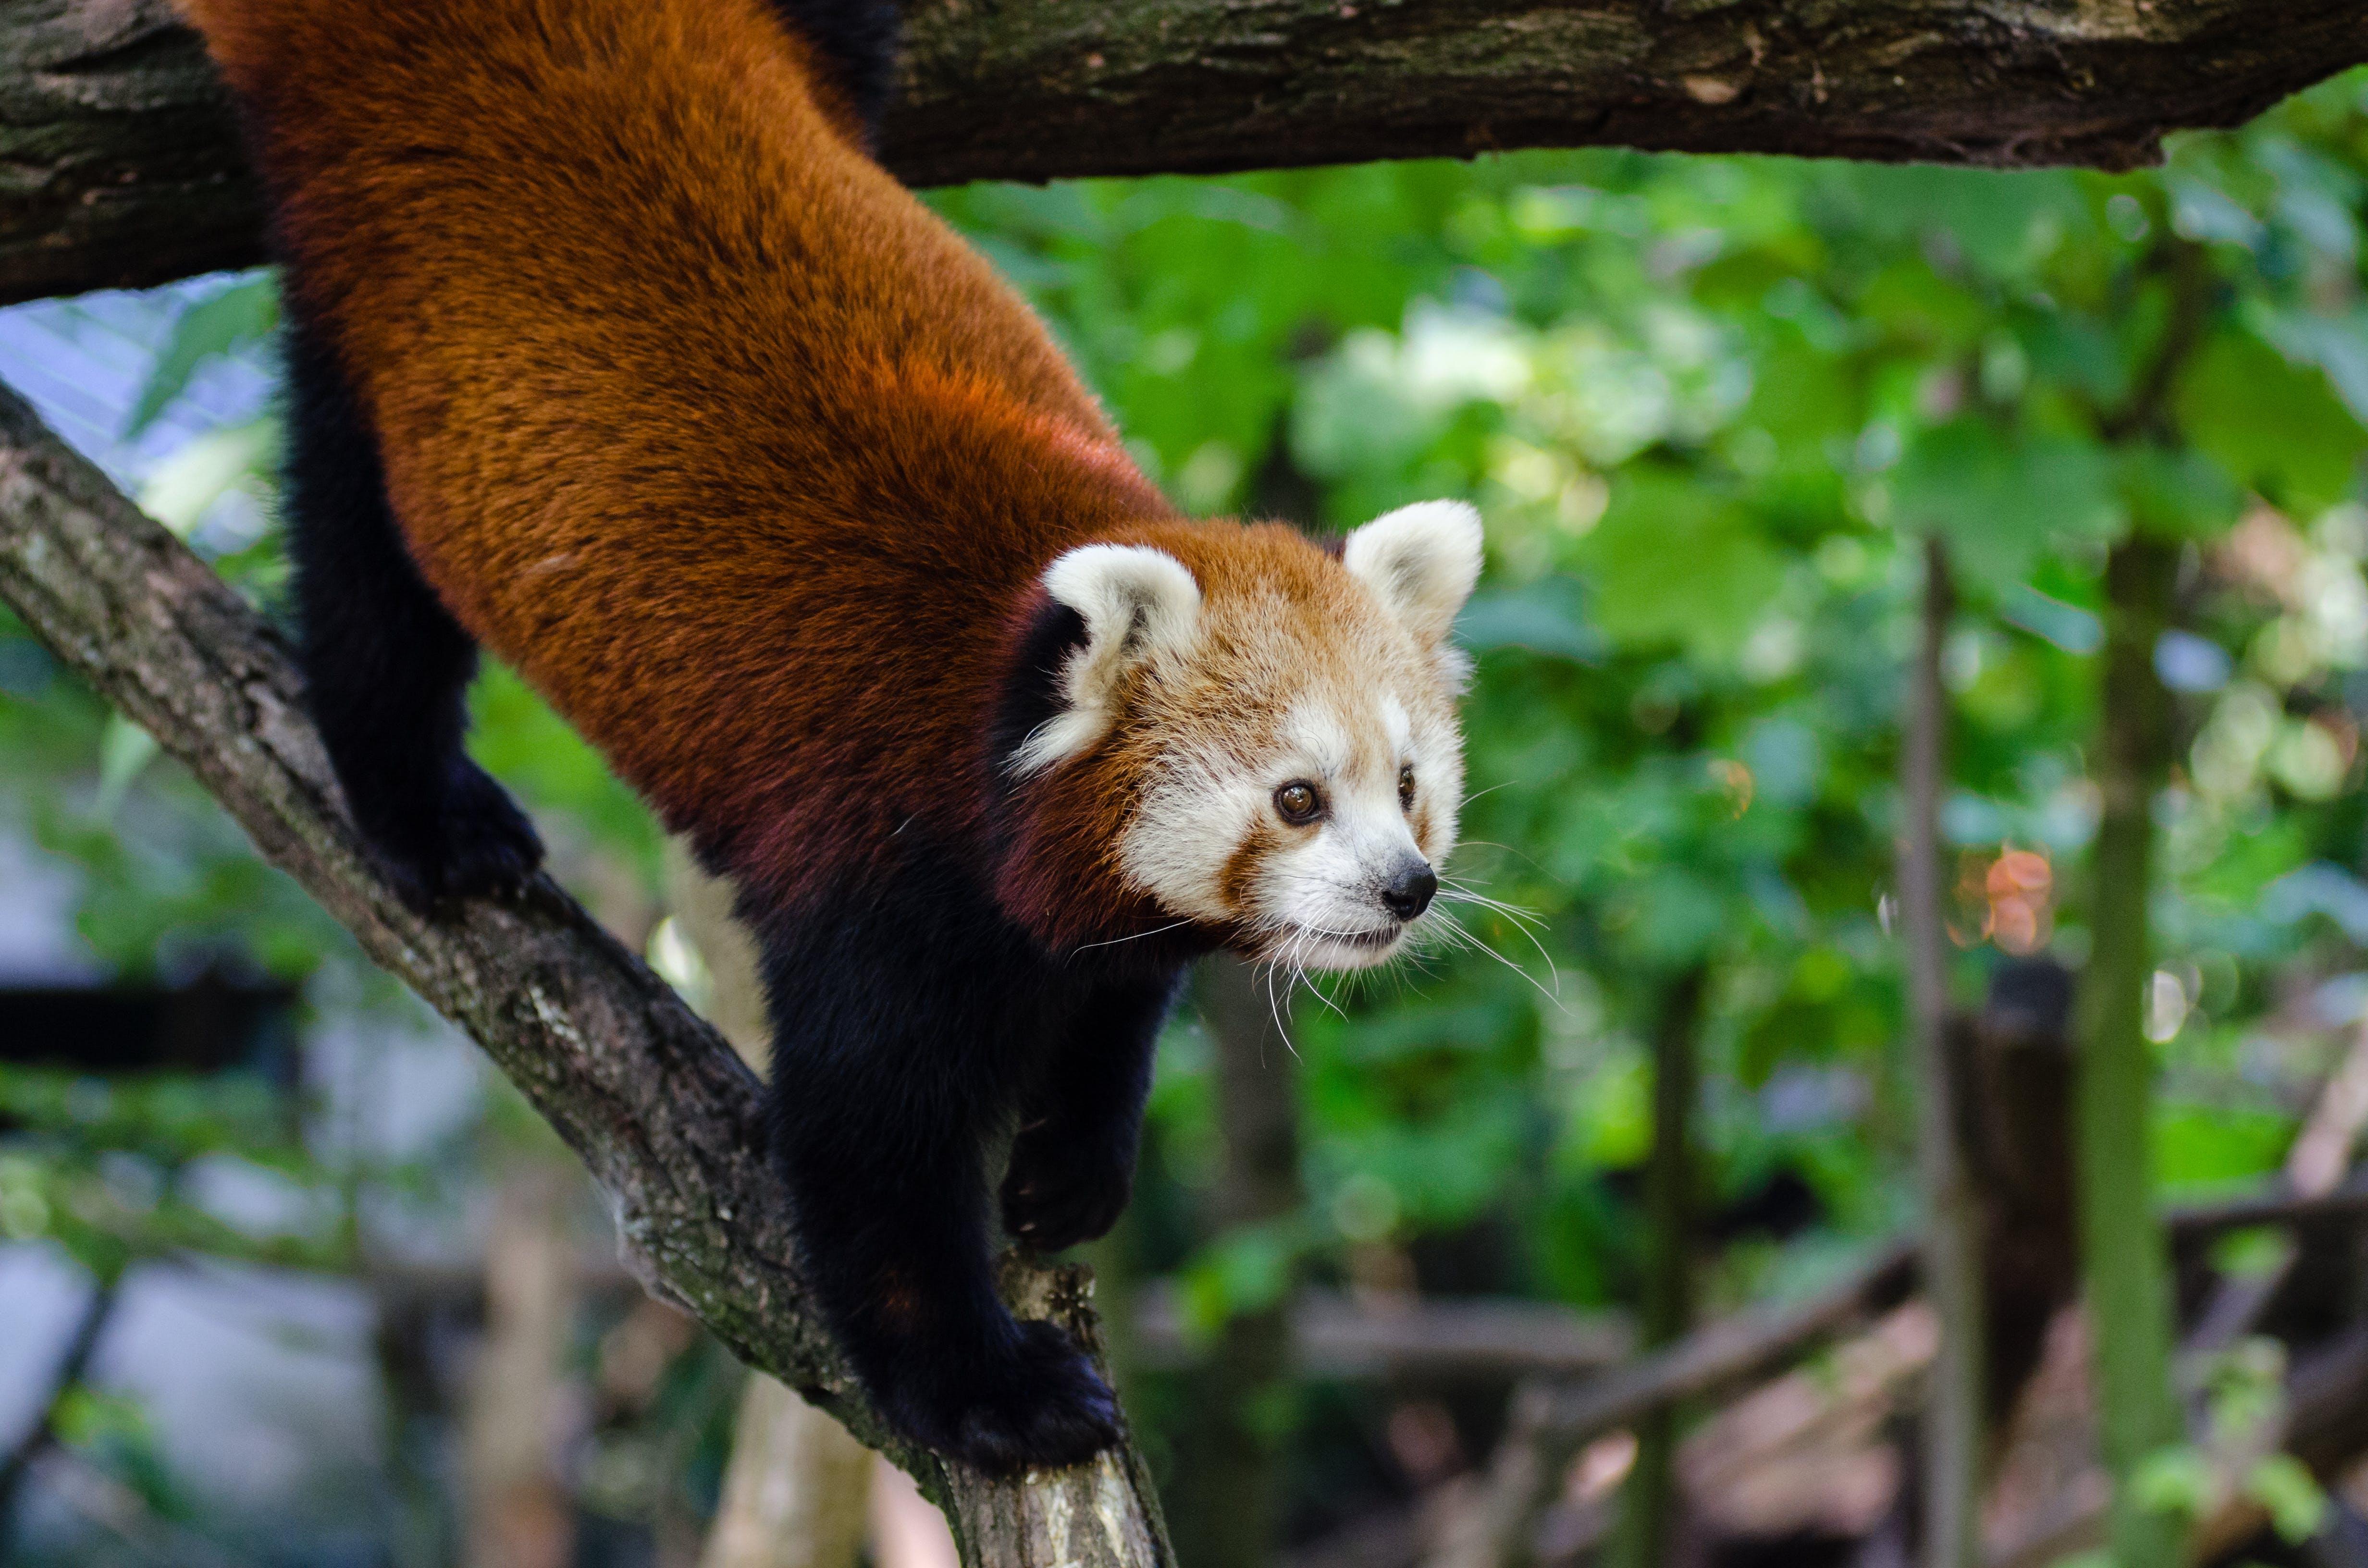 Kostenloses Stock Foto zu makro, niedlich, roter panda, tier